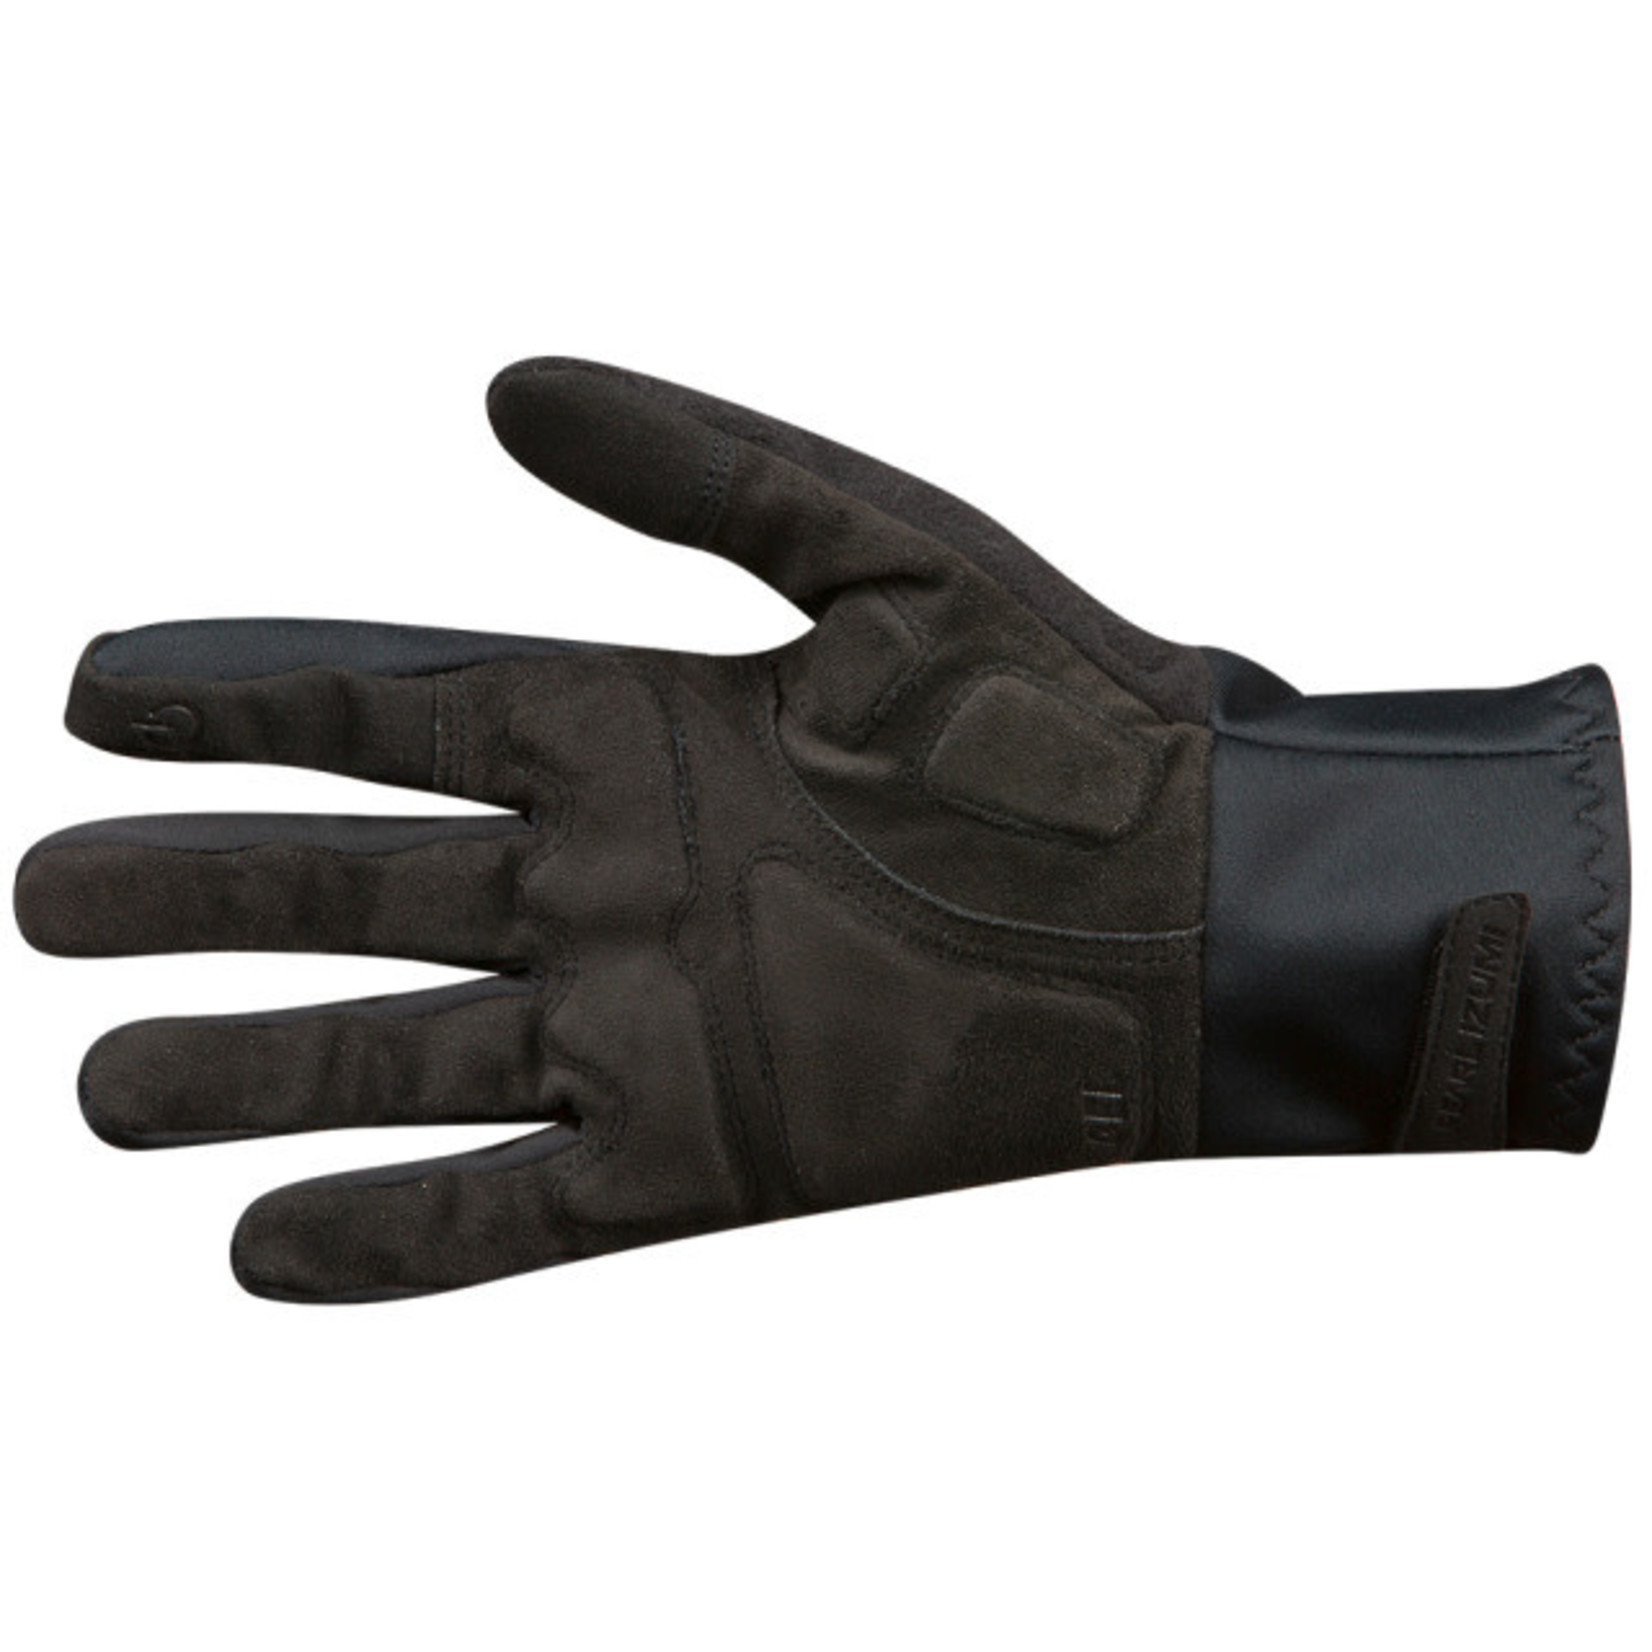 Pearl iZUMi PEARL iZUMi - Handschuhe Cyclone GEL - Black